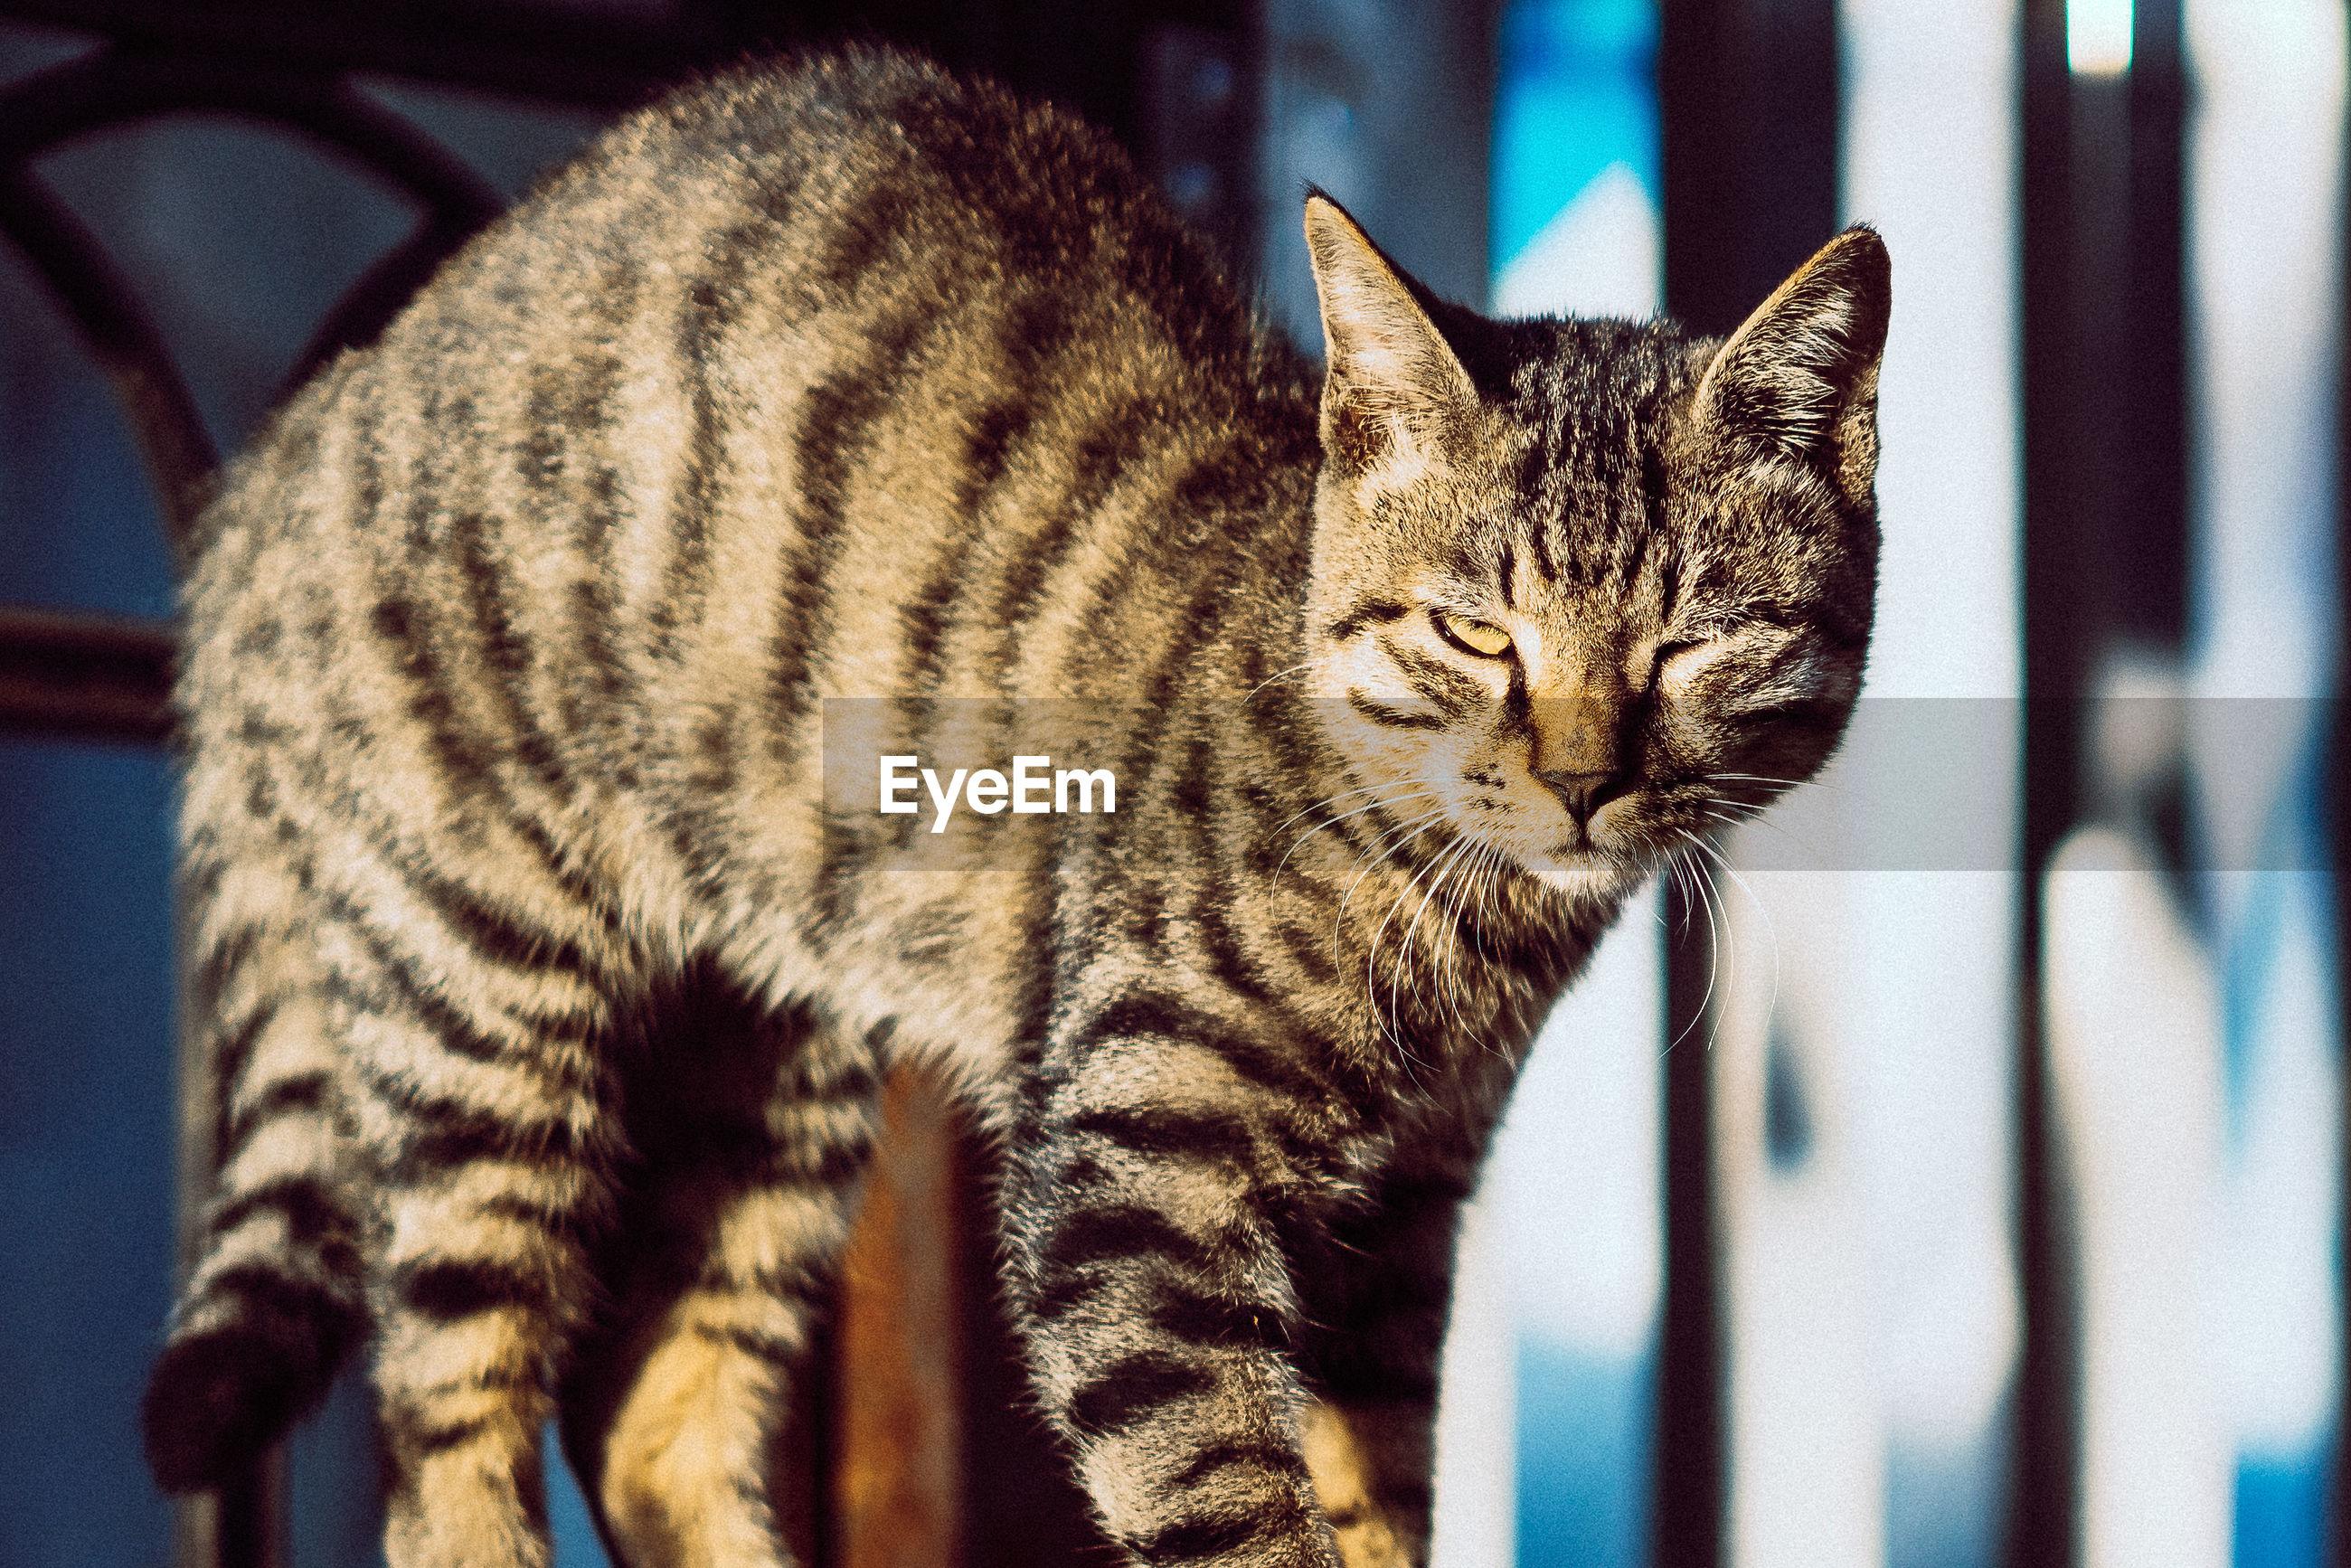 Close-up portrait of cat standing indoors